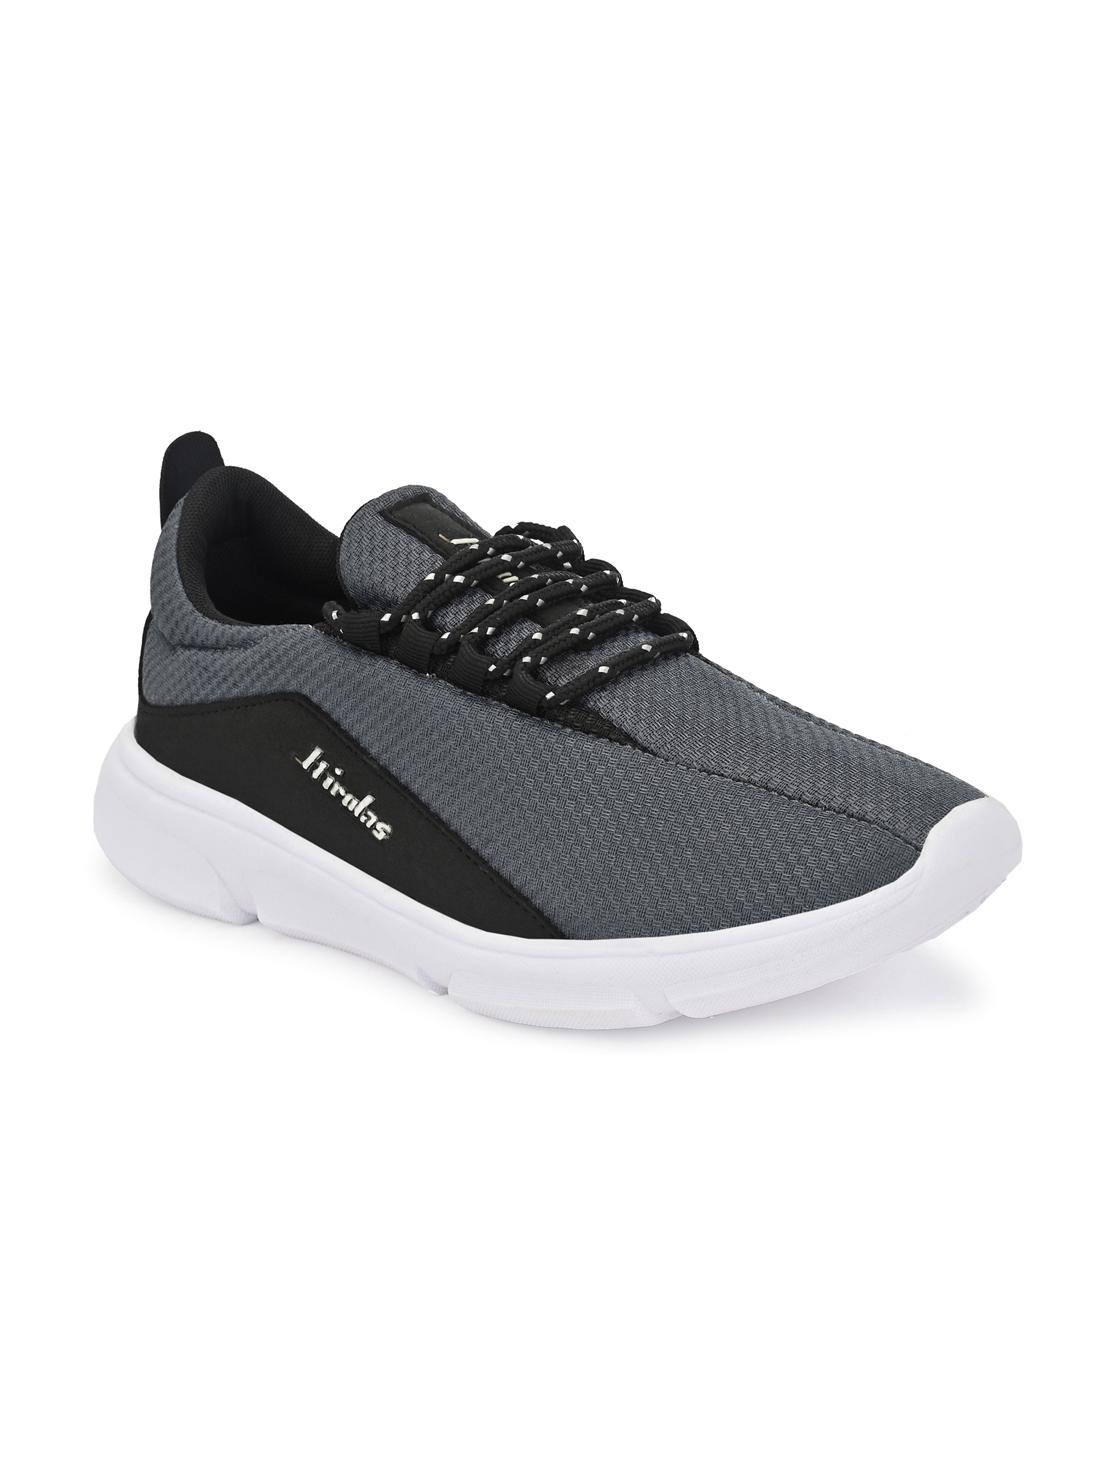 Hirolas   Hirolas Athleisure Sports Walking Shoes - Grey